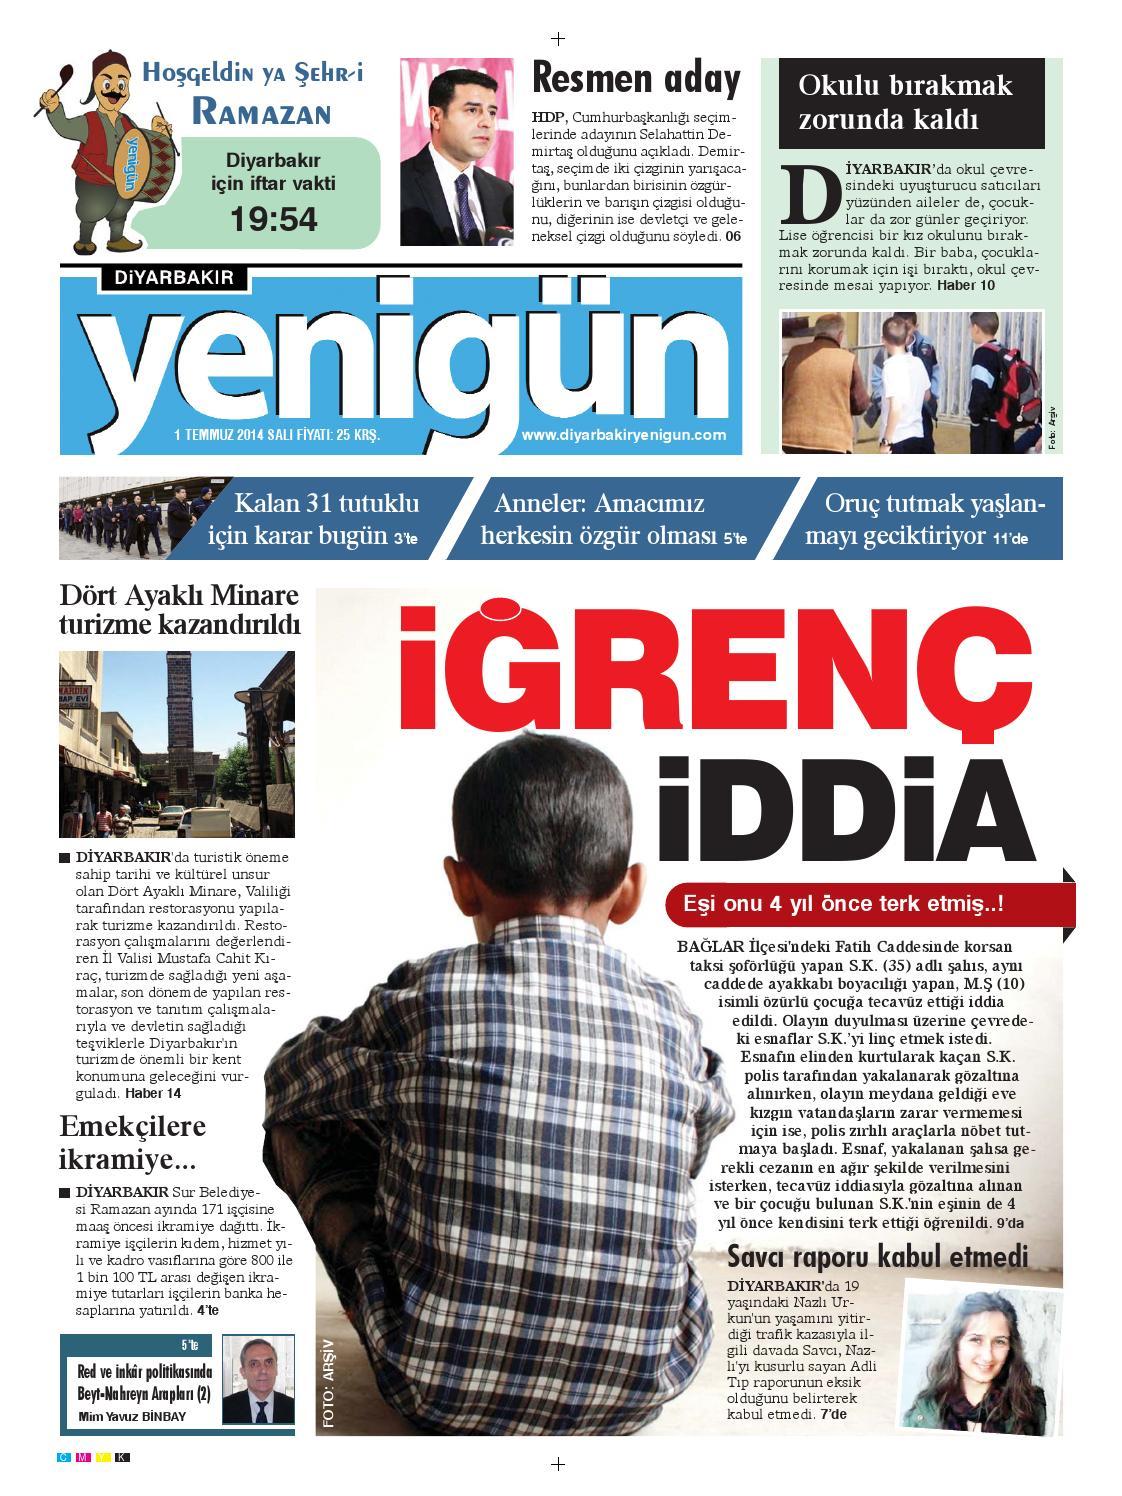 Diyarbakir Yenigun Gazetesi 1temmuz 2014 By Osman Ergun Issuu